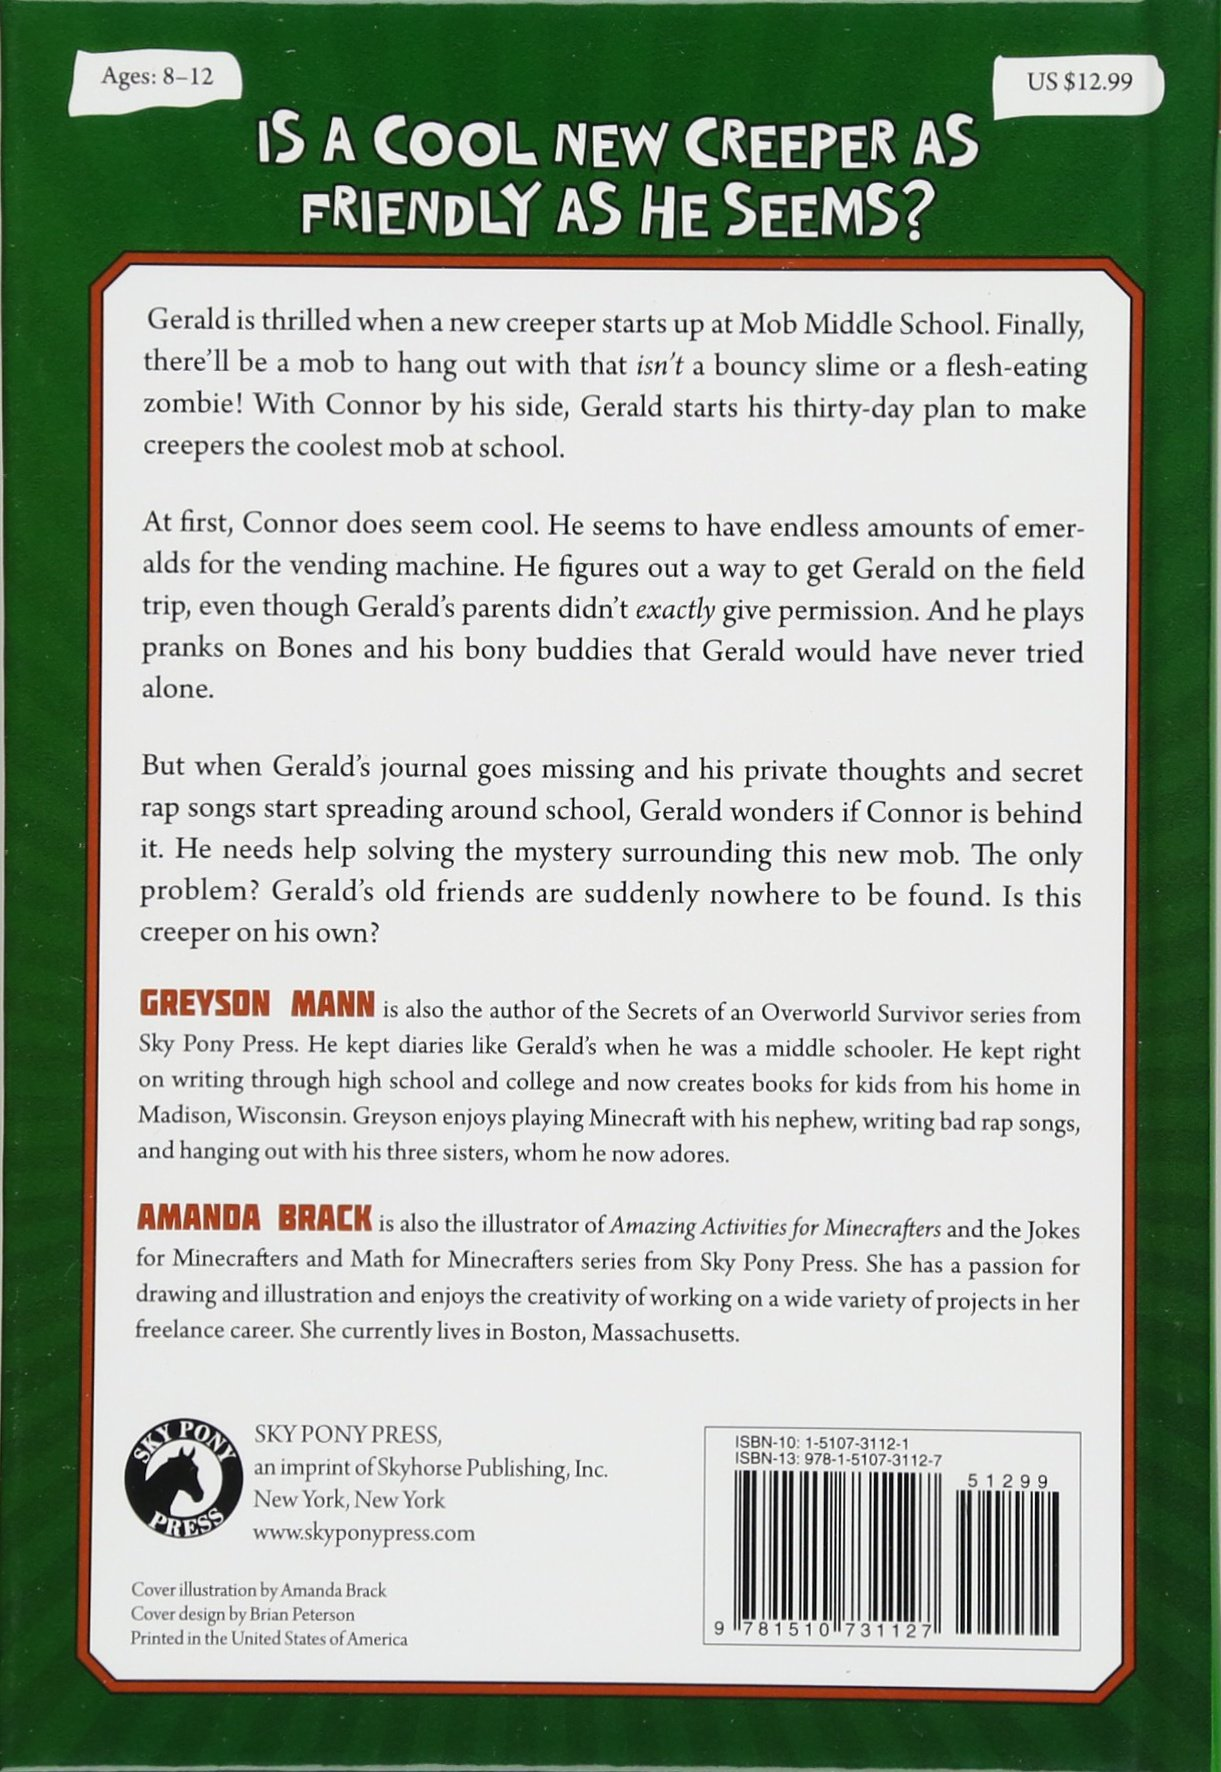 Perfect Www Cool Math 4 Kids Crest - Math Worksheets - modopol.com